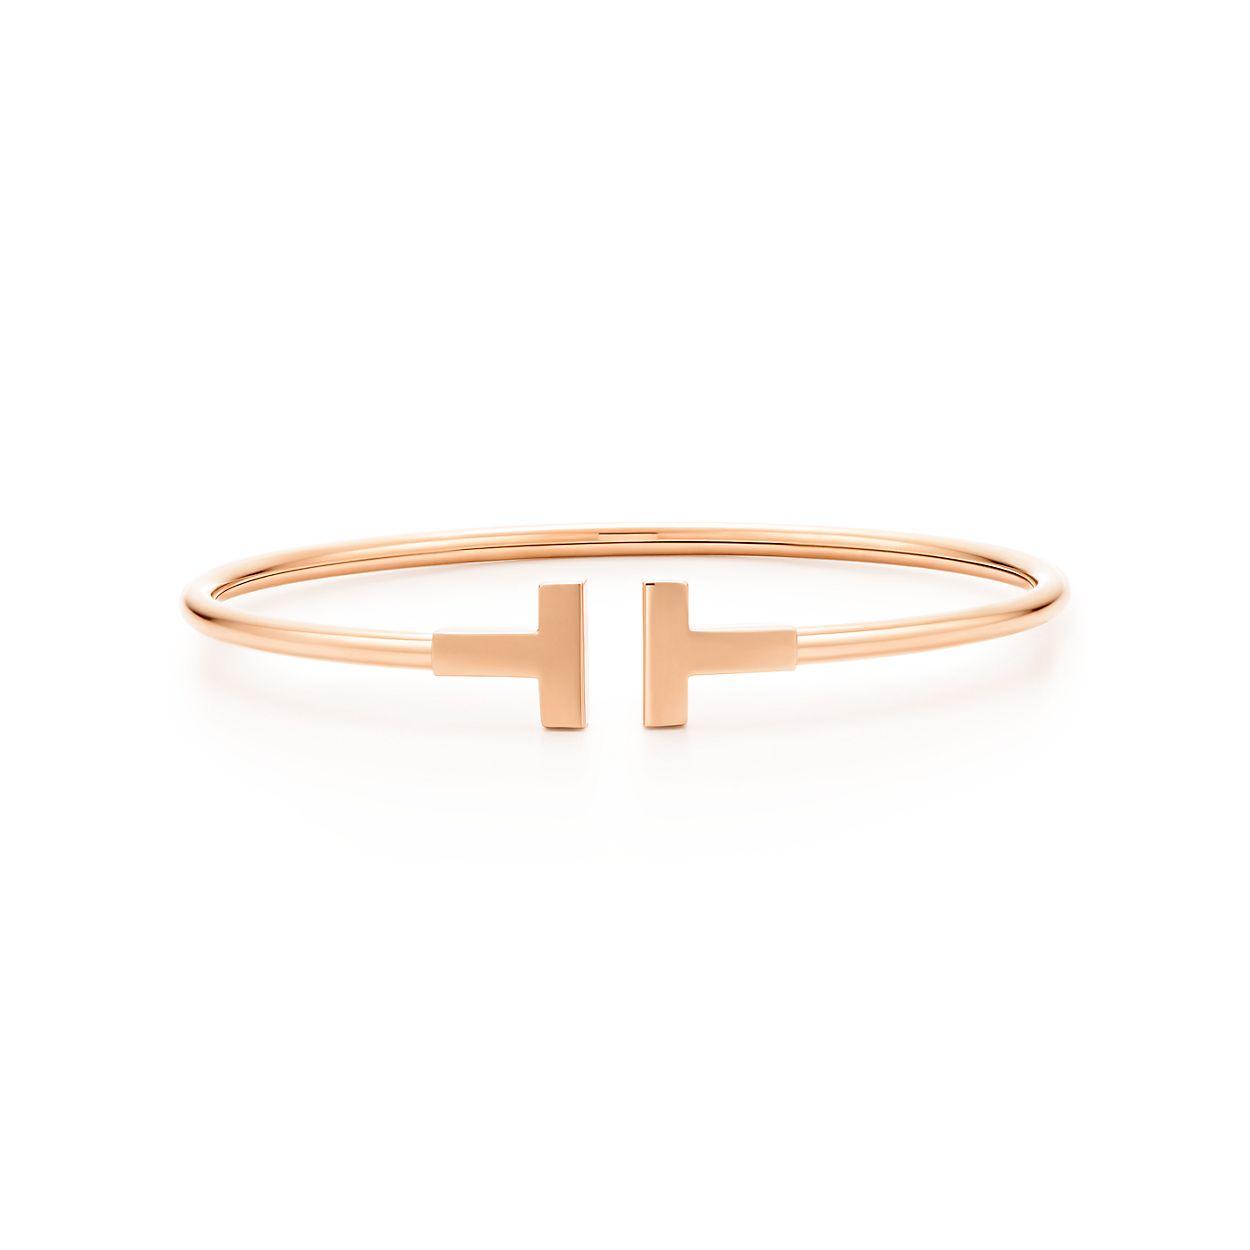 Tiffany T wire bracelet in 18k rose gold, medium. | Tiffany & Co.